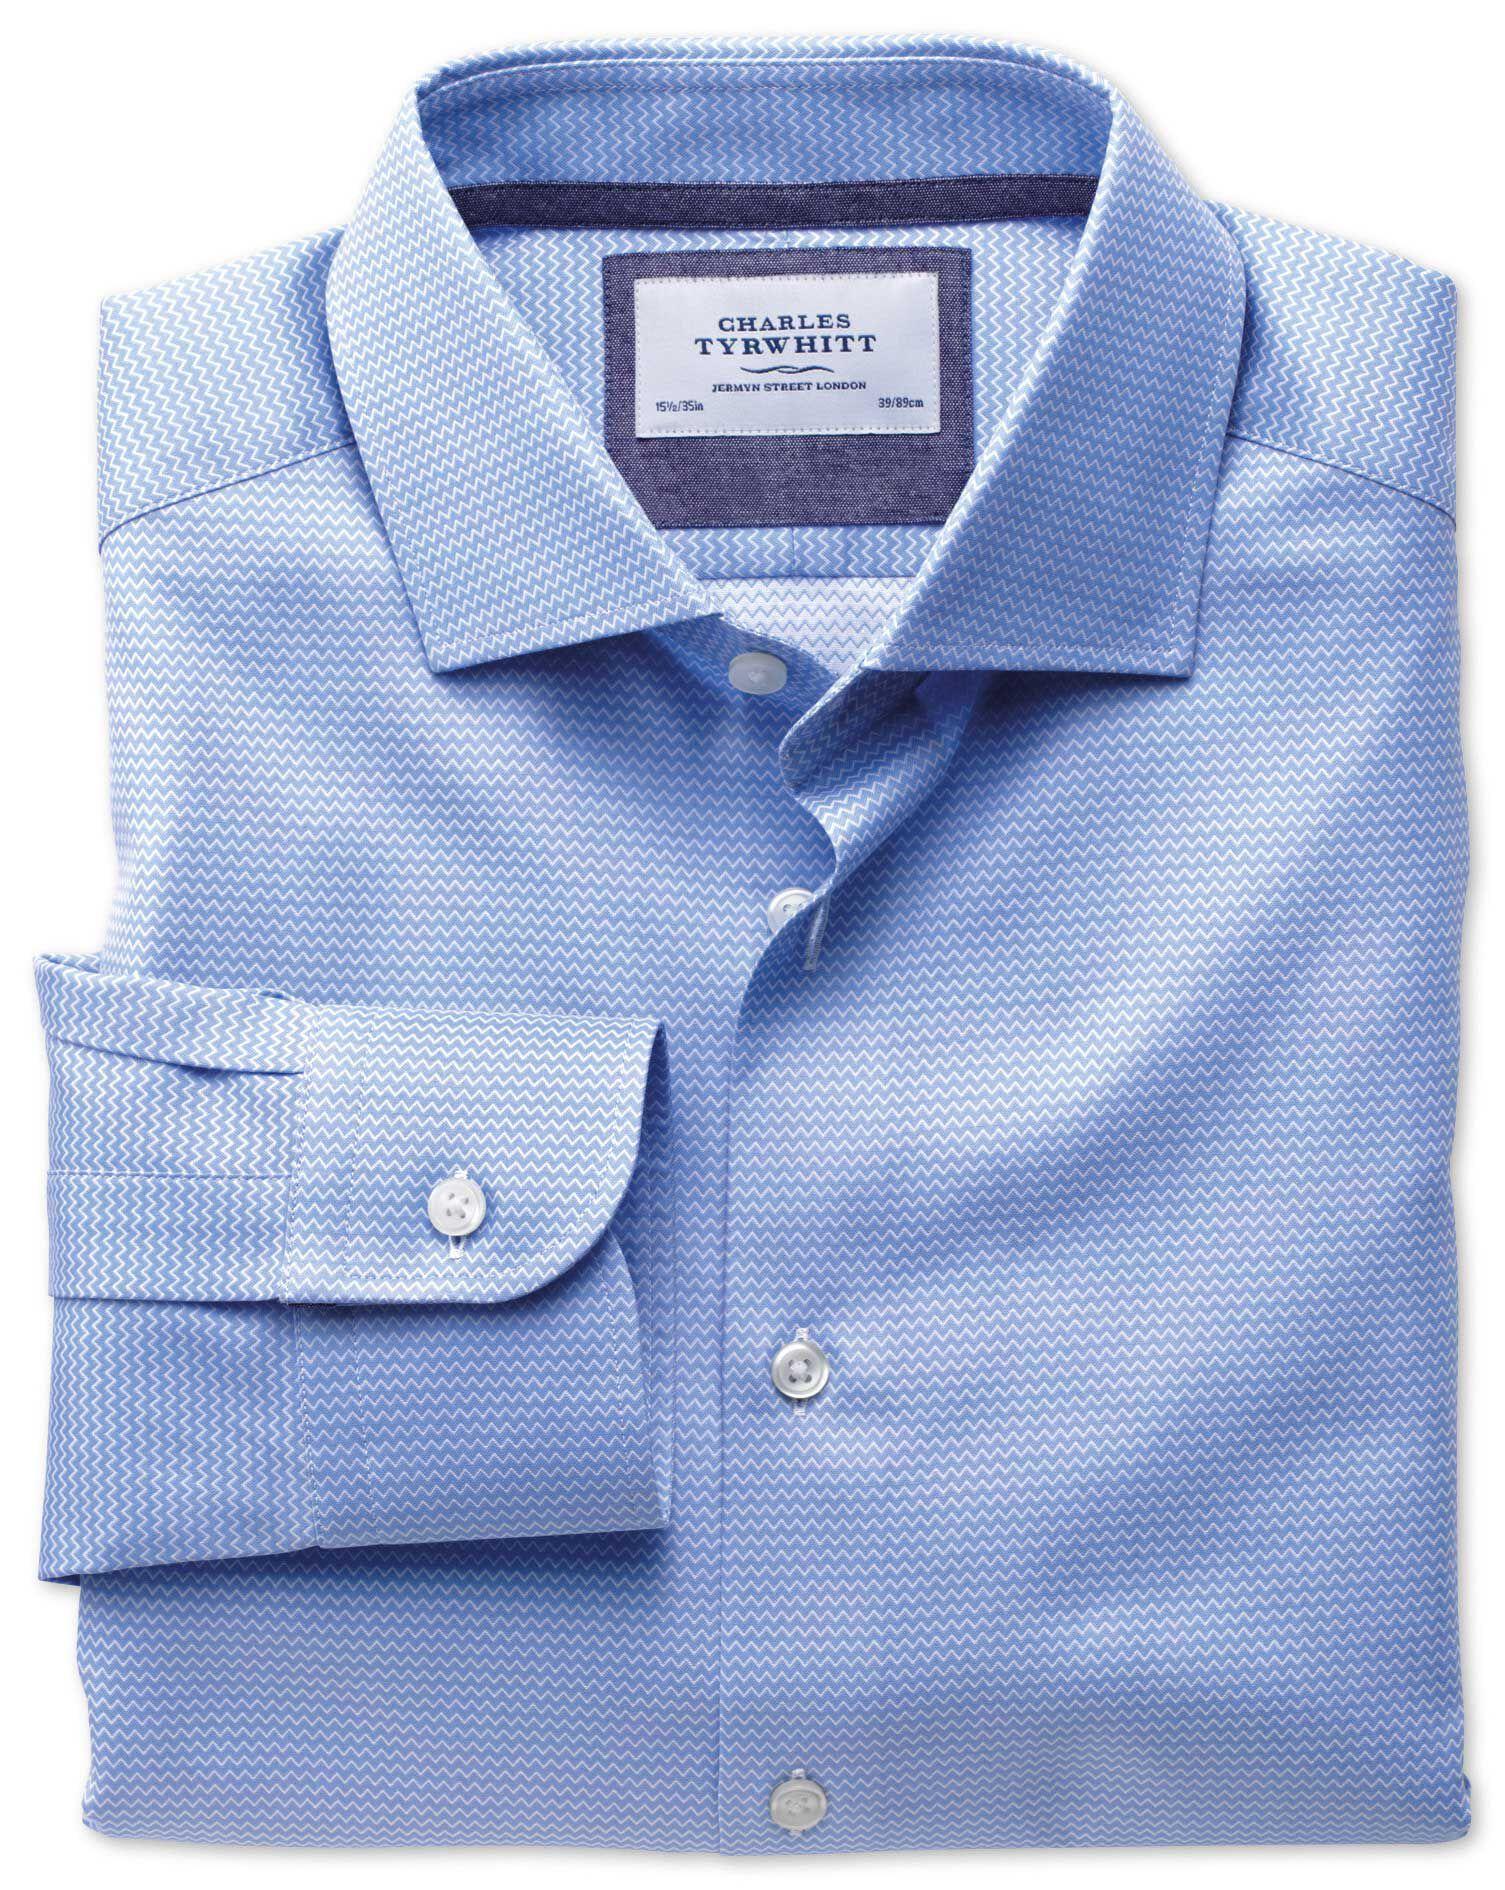 Slim Fit Semi-Cutaway Collar Business Casual Sky Blue Egyptian Cotton Formal Shirt Single Cuff Size